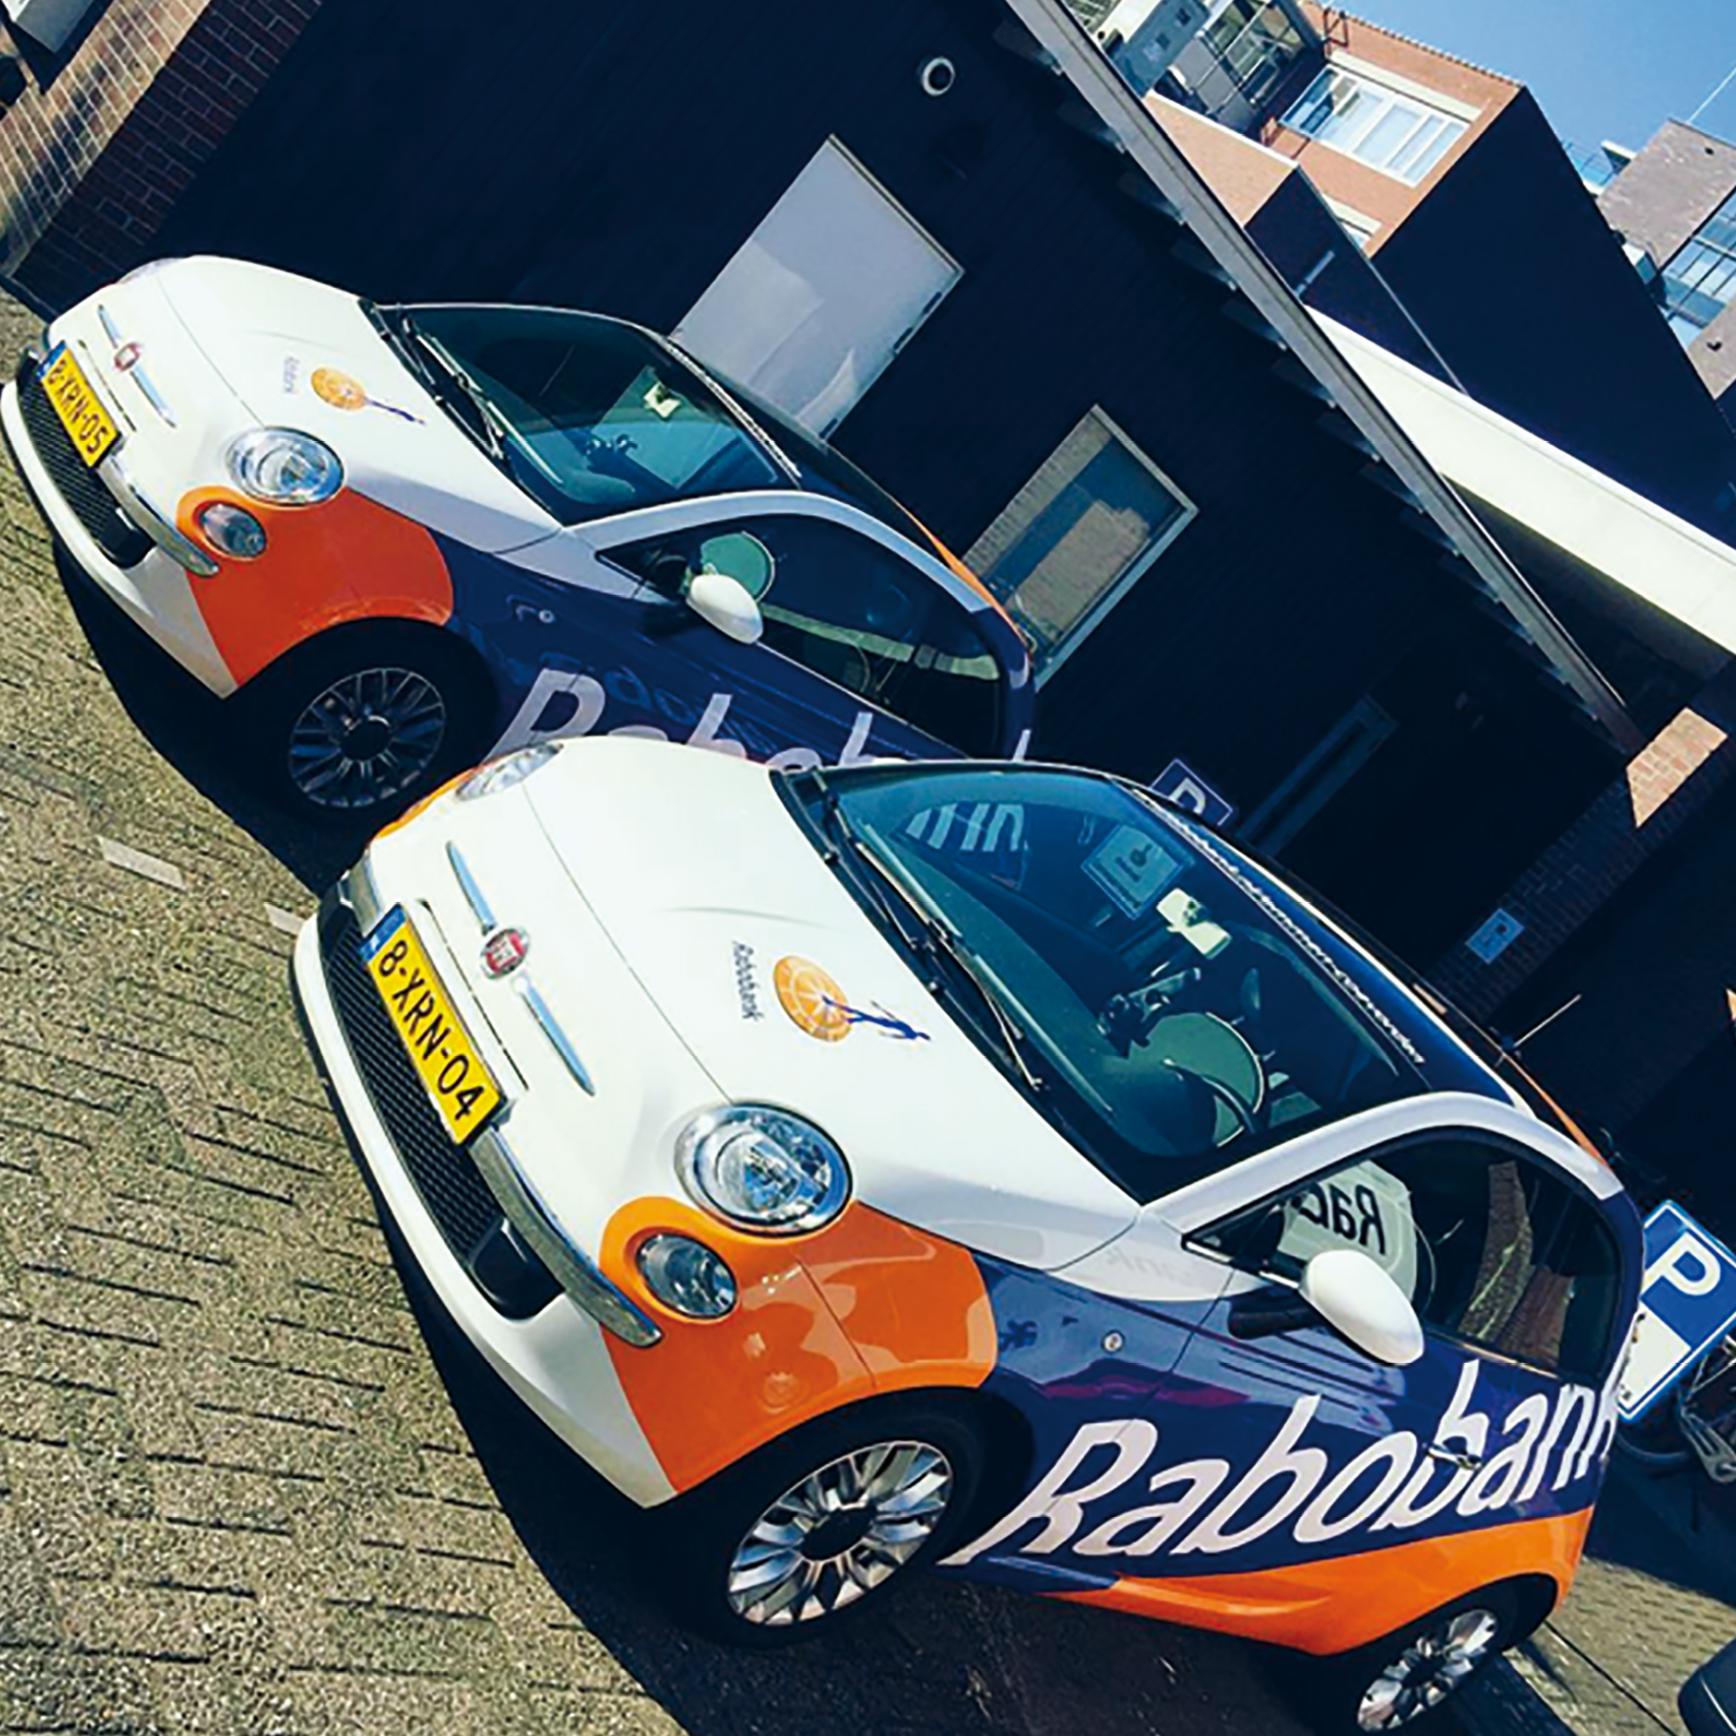 Rabobank Emmen - Coevorden